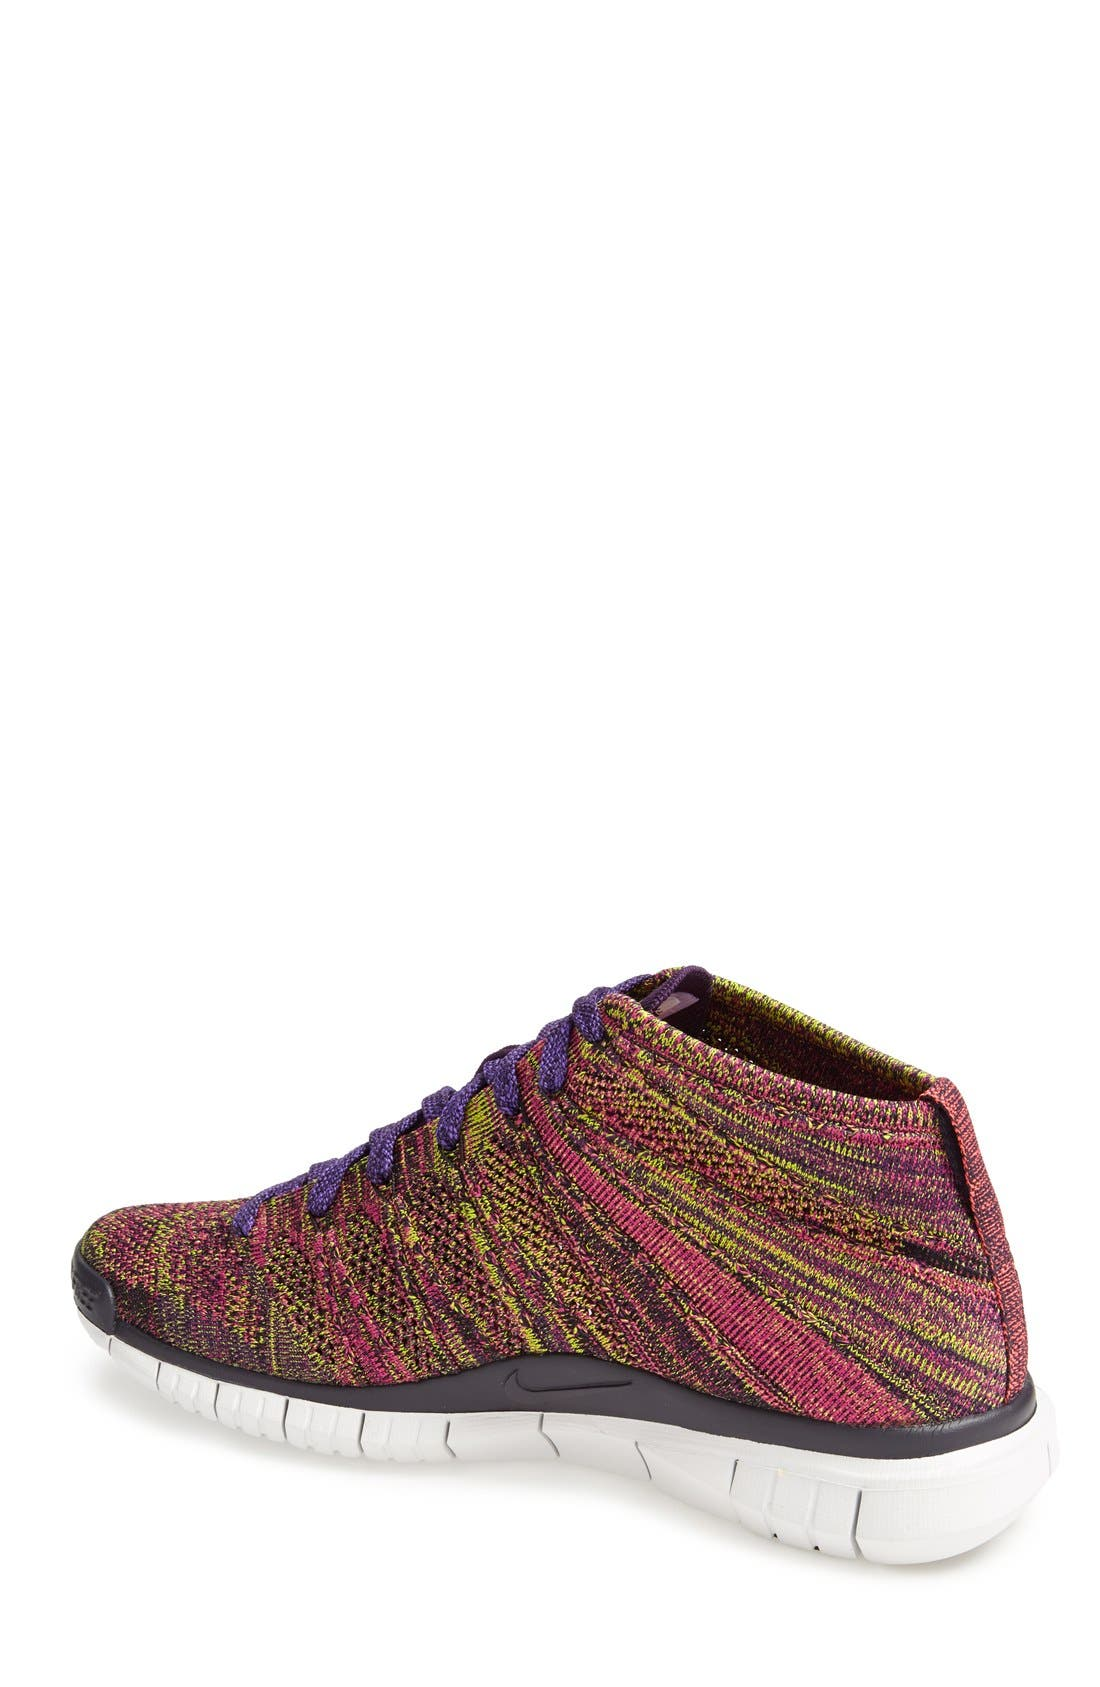 Alternate Image 2  - Nike 'Free Flyknit Chukka' Sneaker (Men)